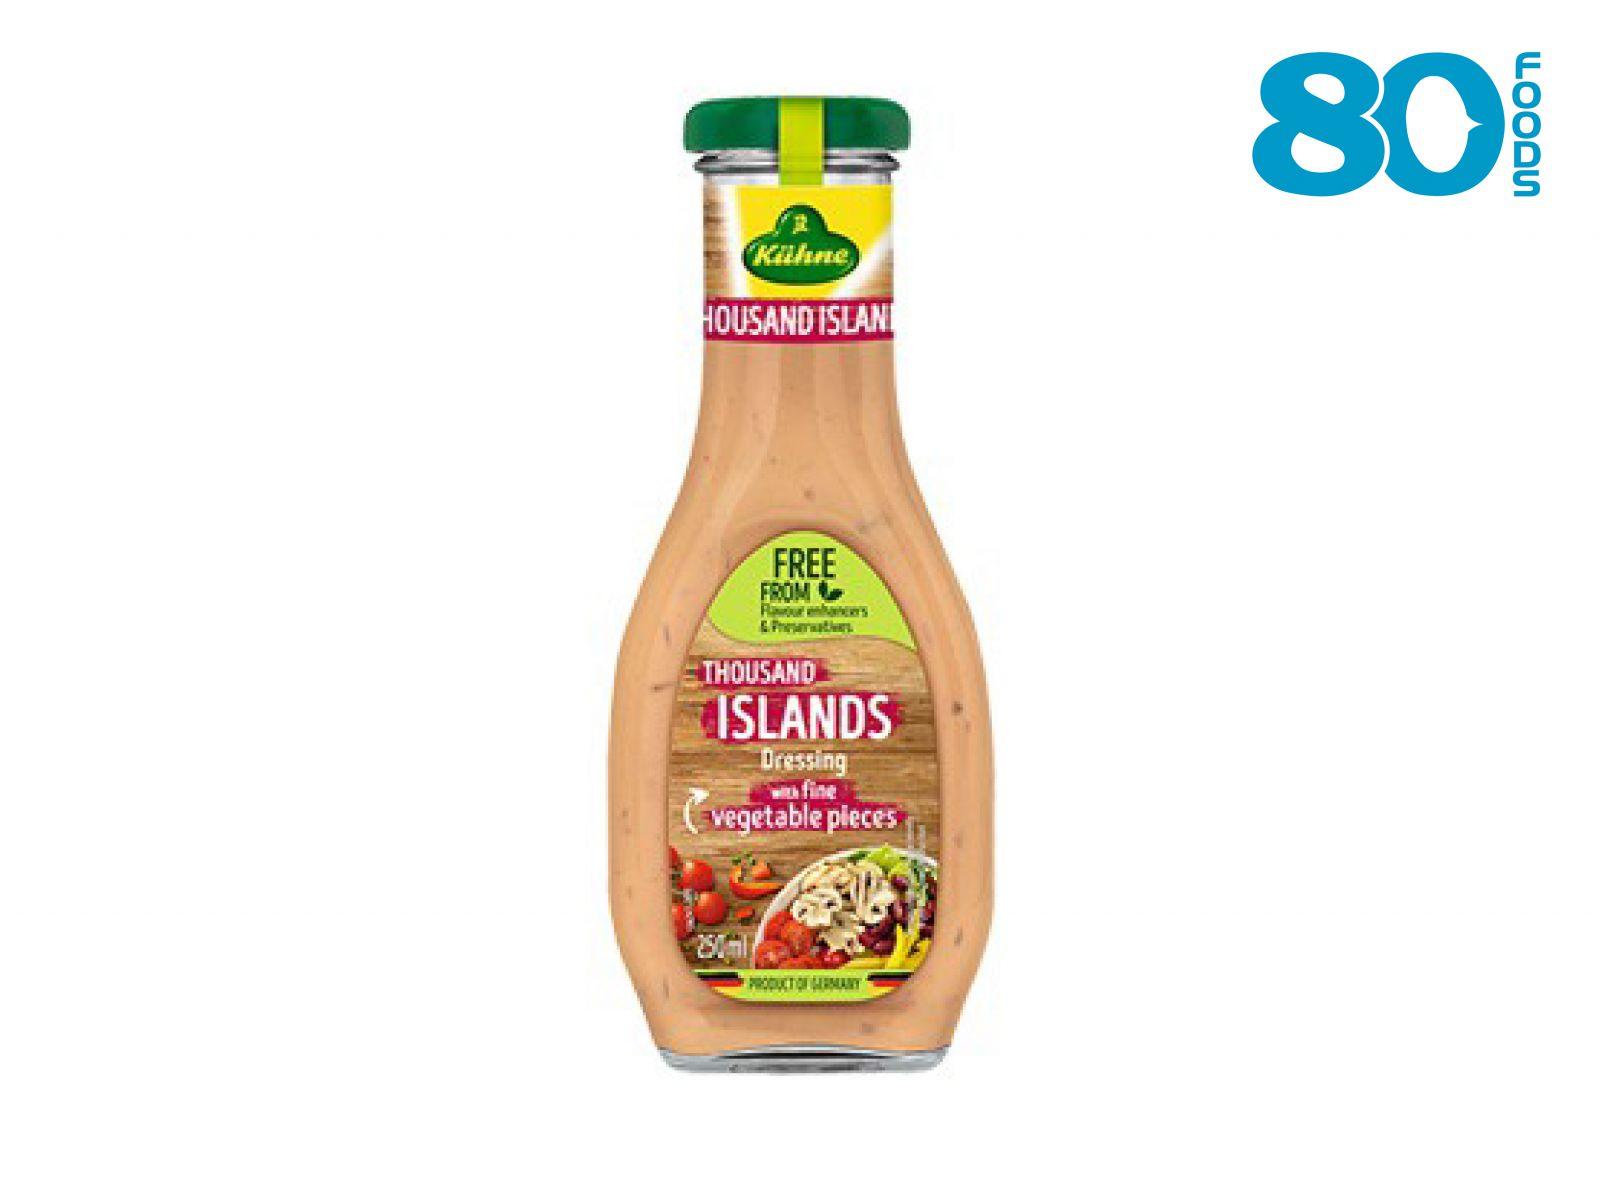 Sốt trộn Salad Thousand Islands Kuhne